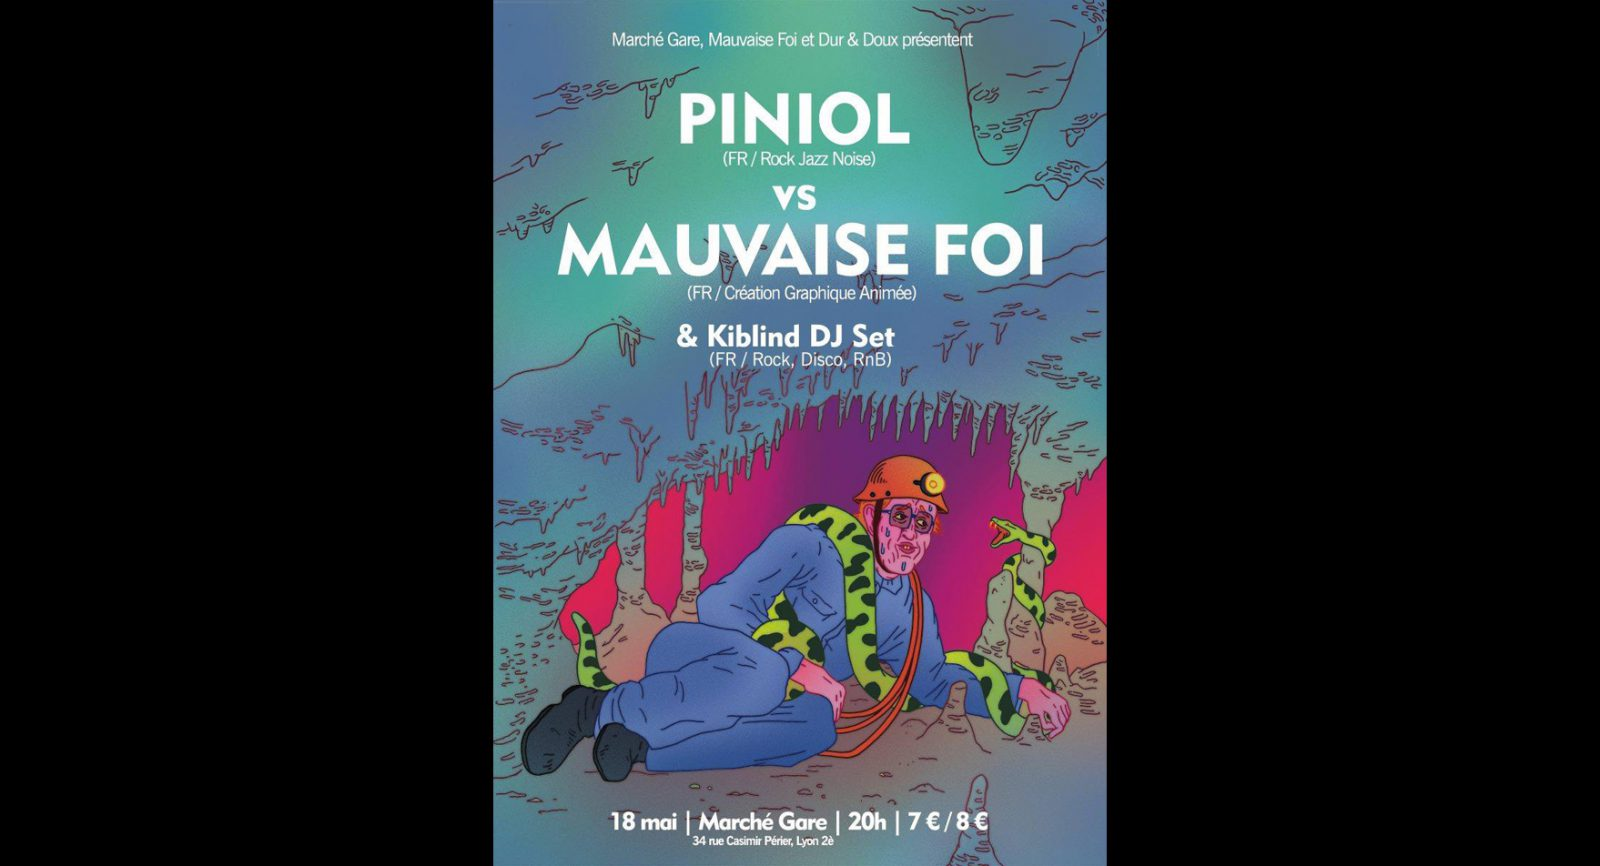 Piniol vs Mauvaise Foi